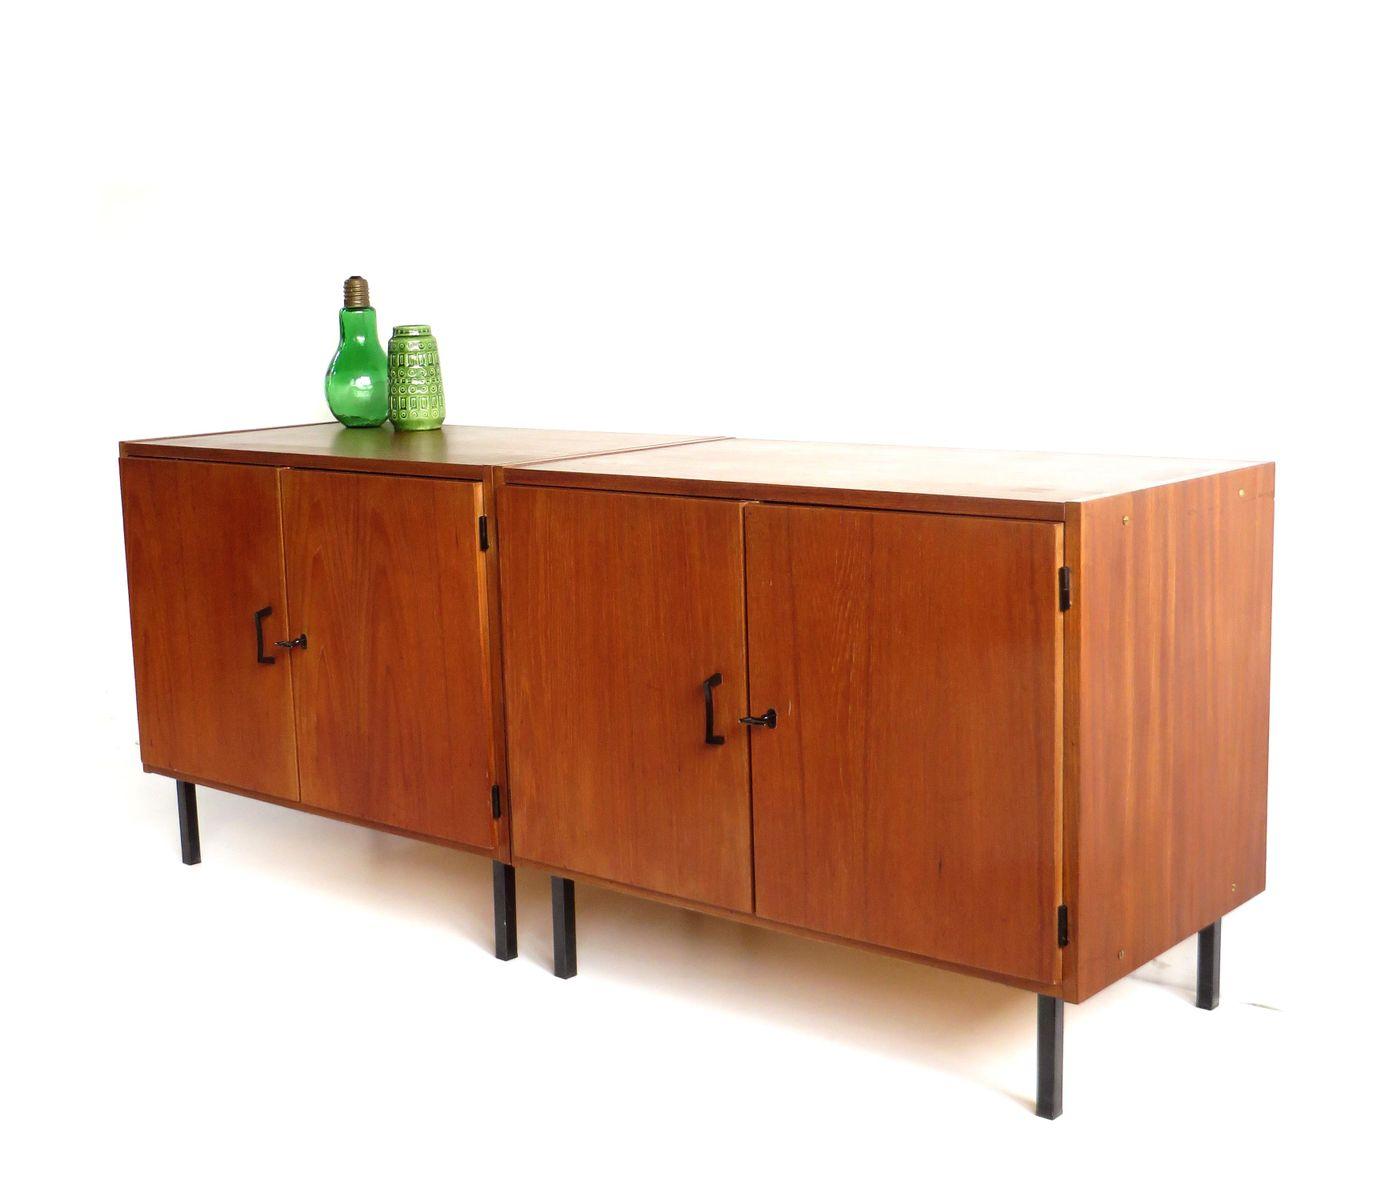 Teak sideboards 1960s set of 2 for sale at pamono for Sideboard 3 meter lang